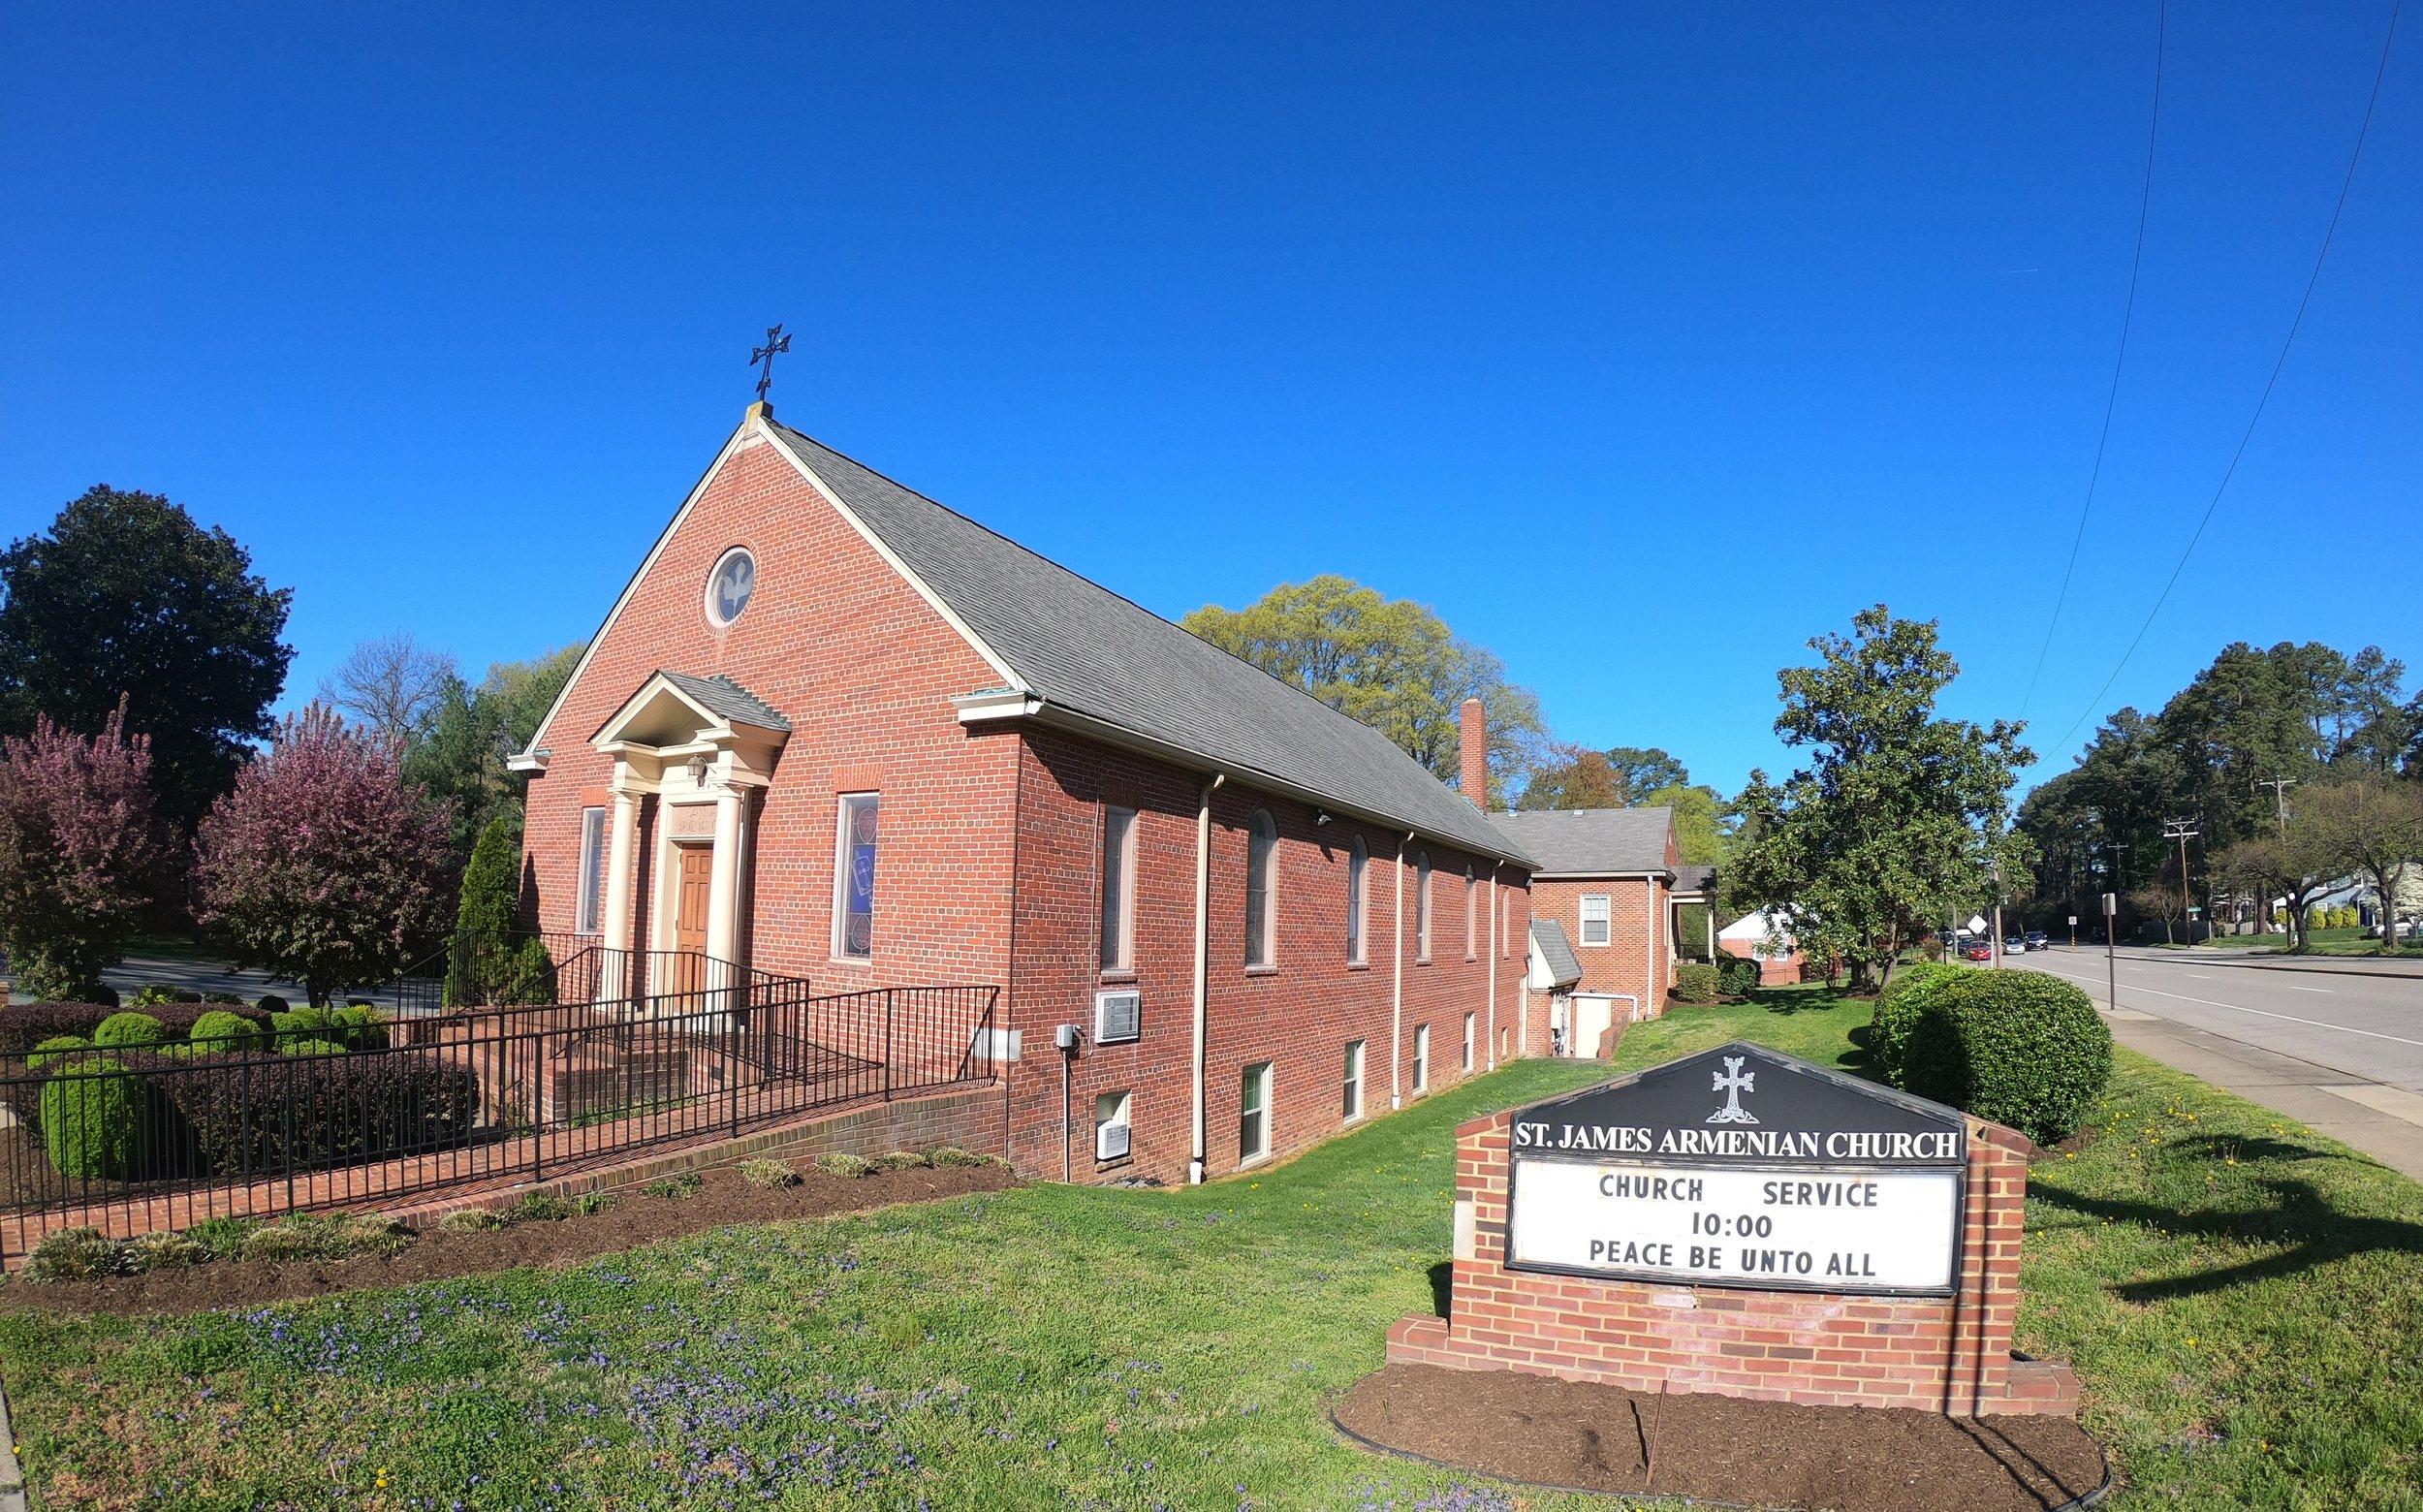 St. James Armenian Church in Richmond, VA